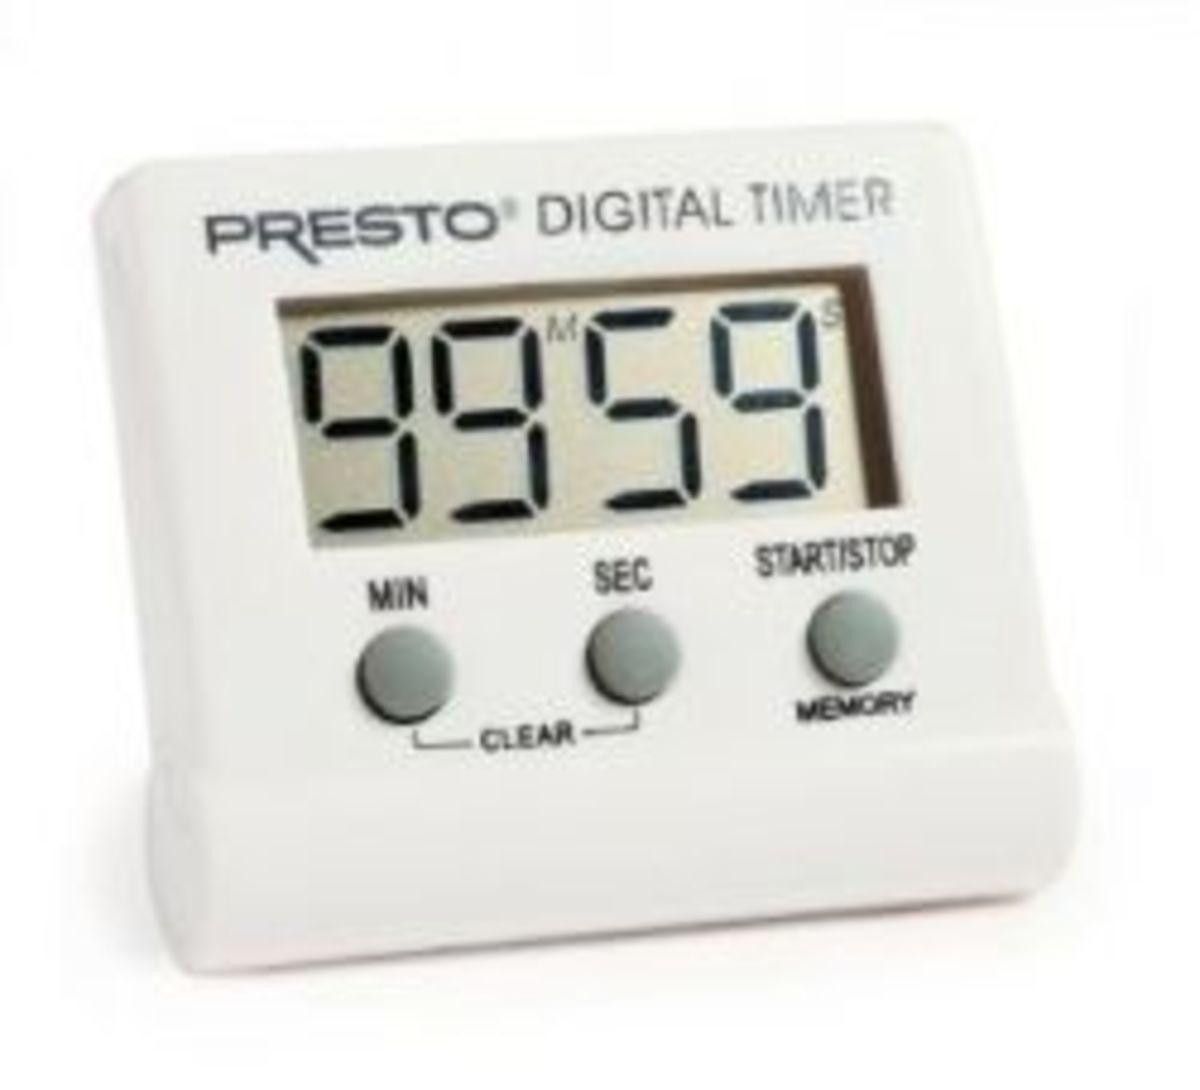 Image credit: http://www.amazon.com/Presto-04213-Electronic-Digital-Timer/dp/B001CQG618/ref=sr_1_1?ie=UTF8&qid=1348062178&sr=8-1&keywords=digital+timer